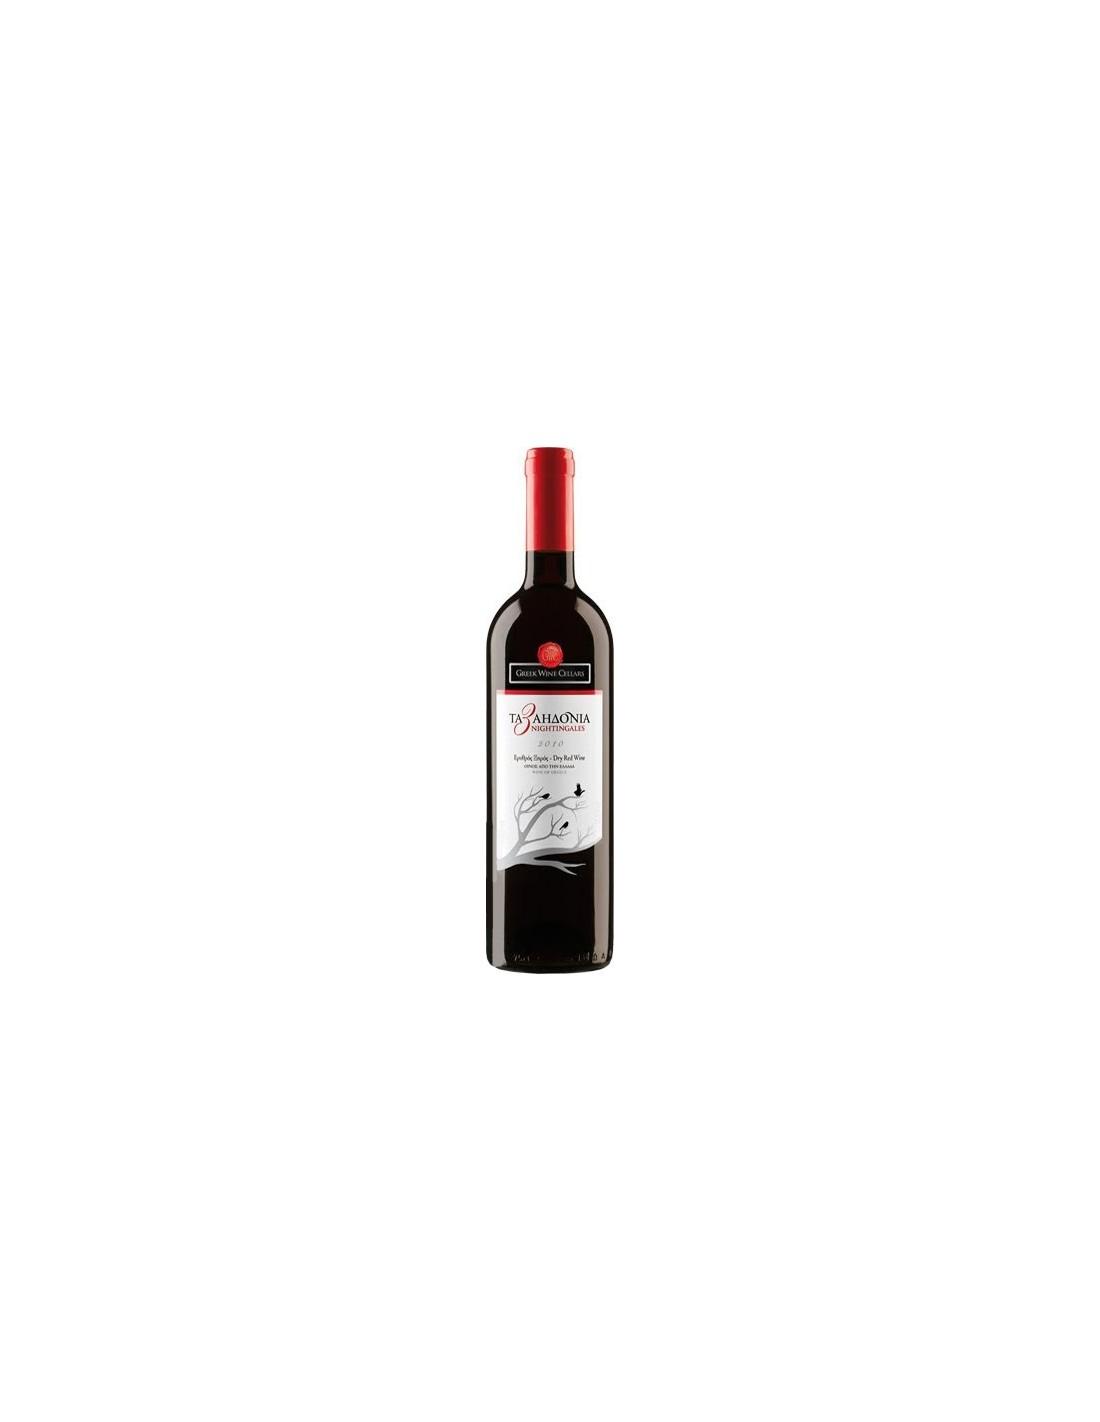 Vin rosu, Cupaj, The 3nightingales Nemea, 0.75L, Grecia